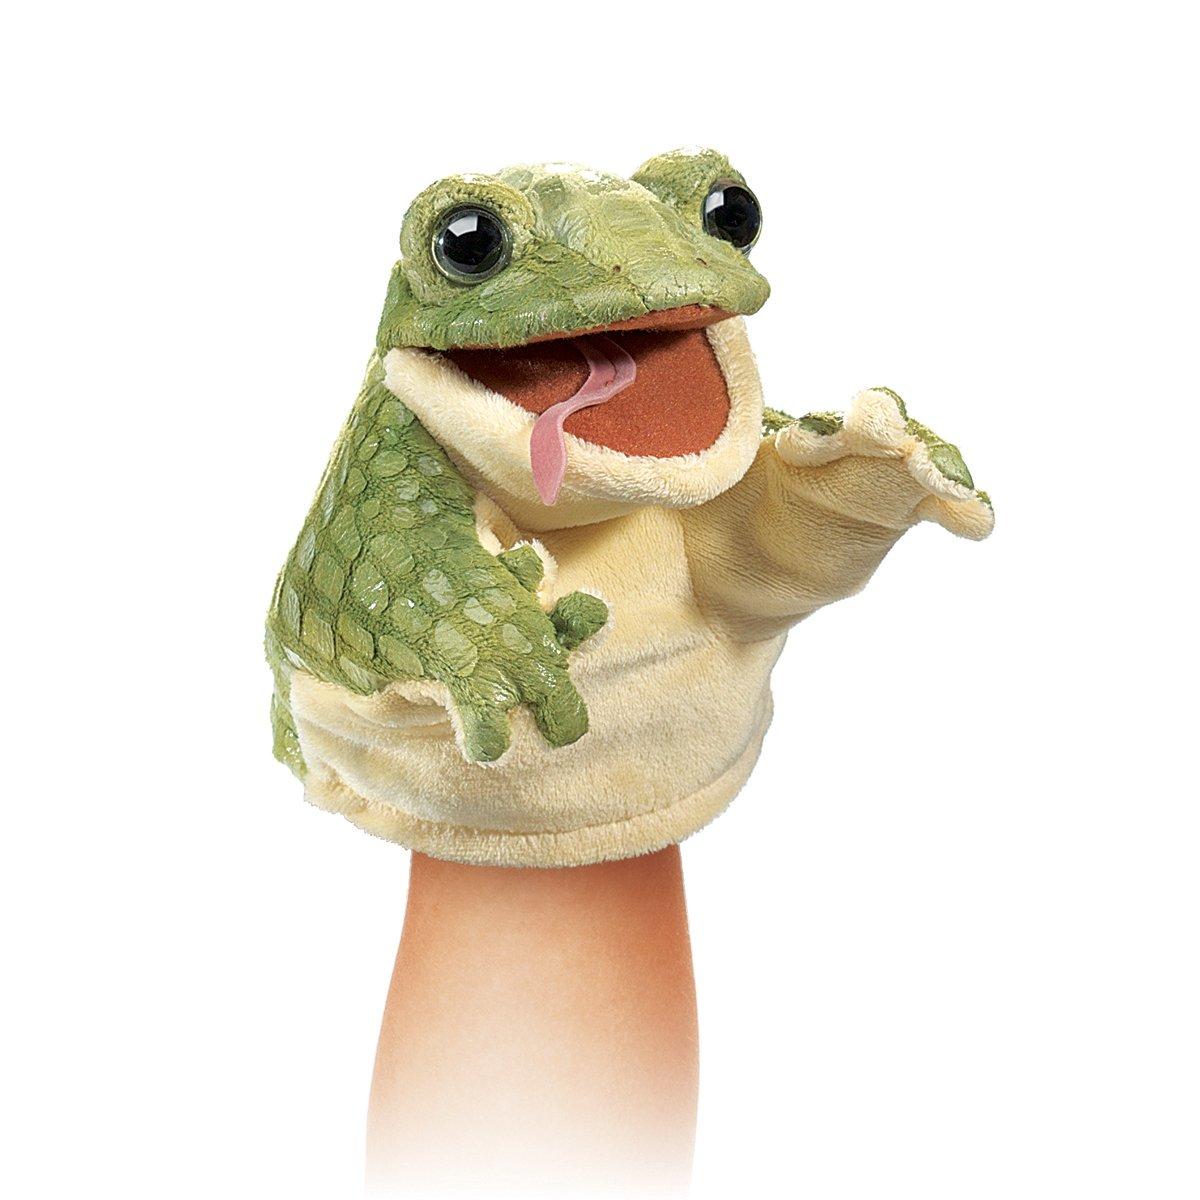 tomar hasta un 70% de descuento Folkmanis Puppets - Marioneta Marioneta Marioneta (2965)  online barato